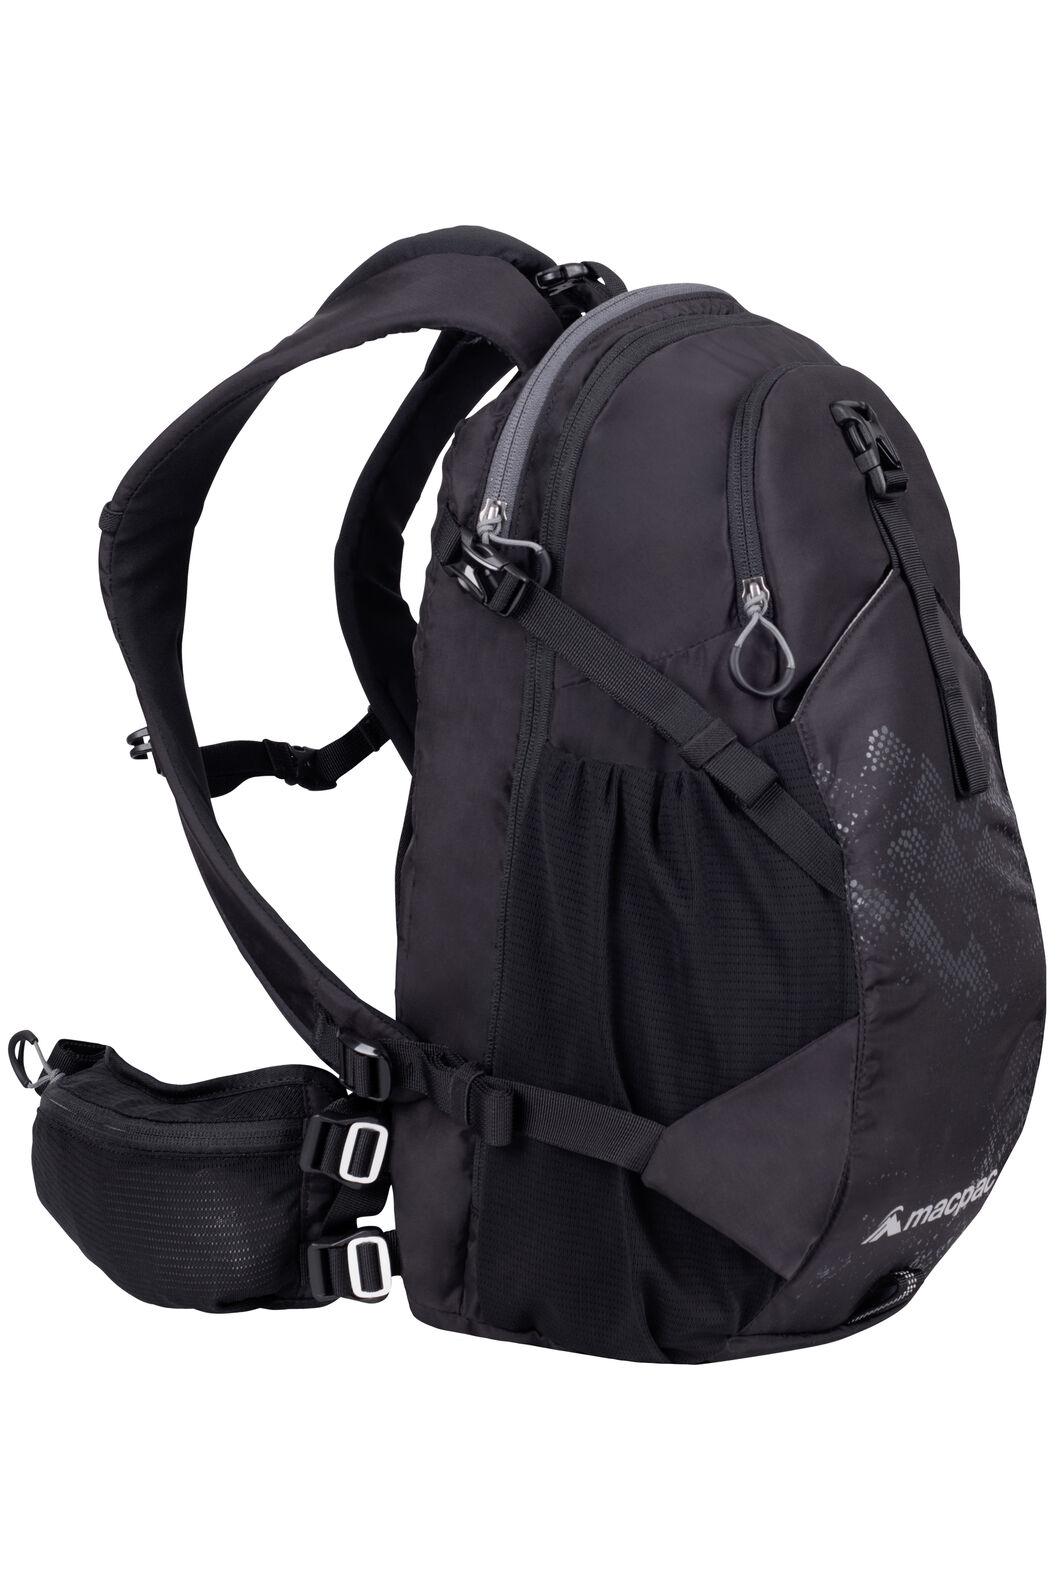 Macpac Mountain Bike 18L Pack, Black, hi-res